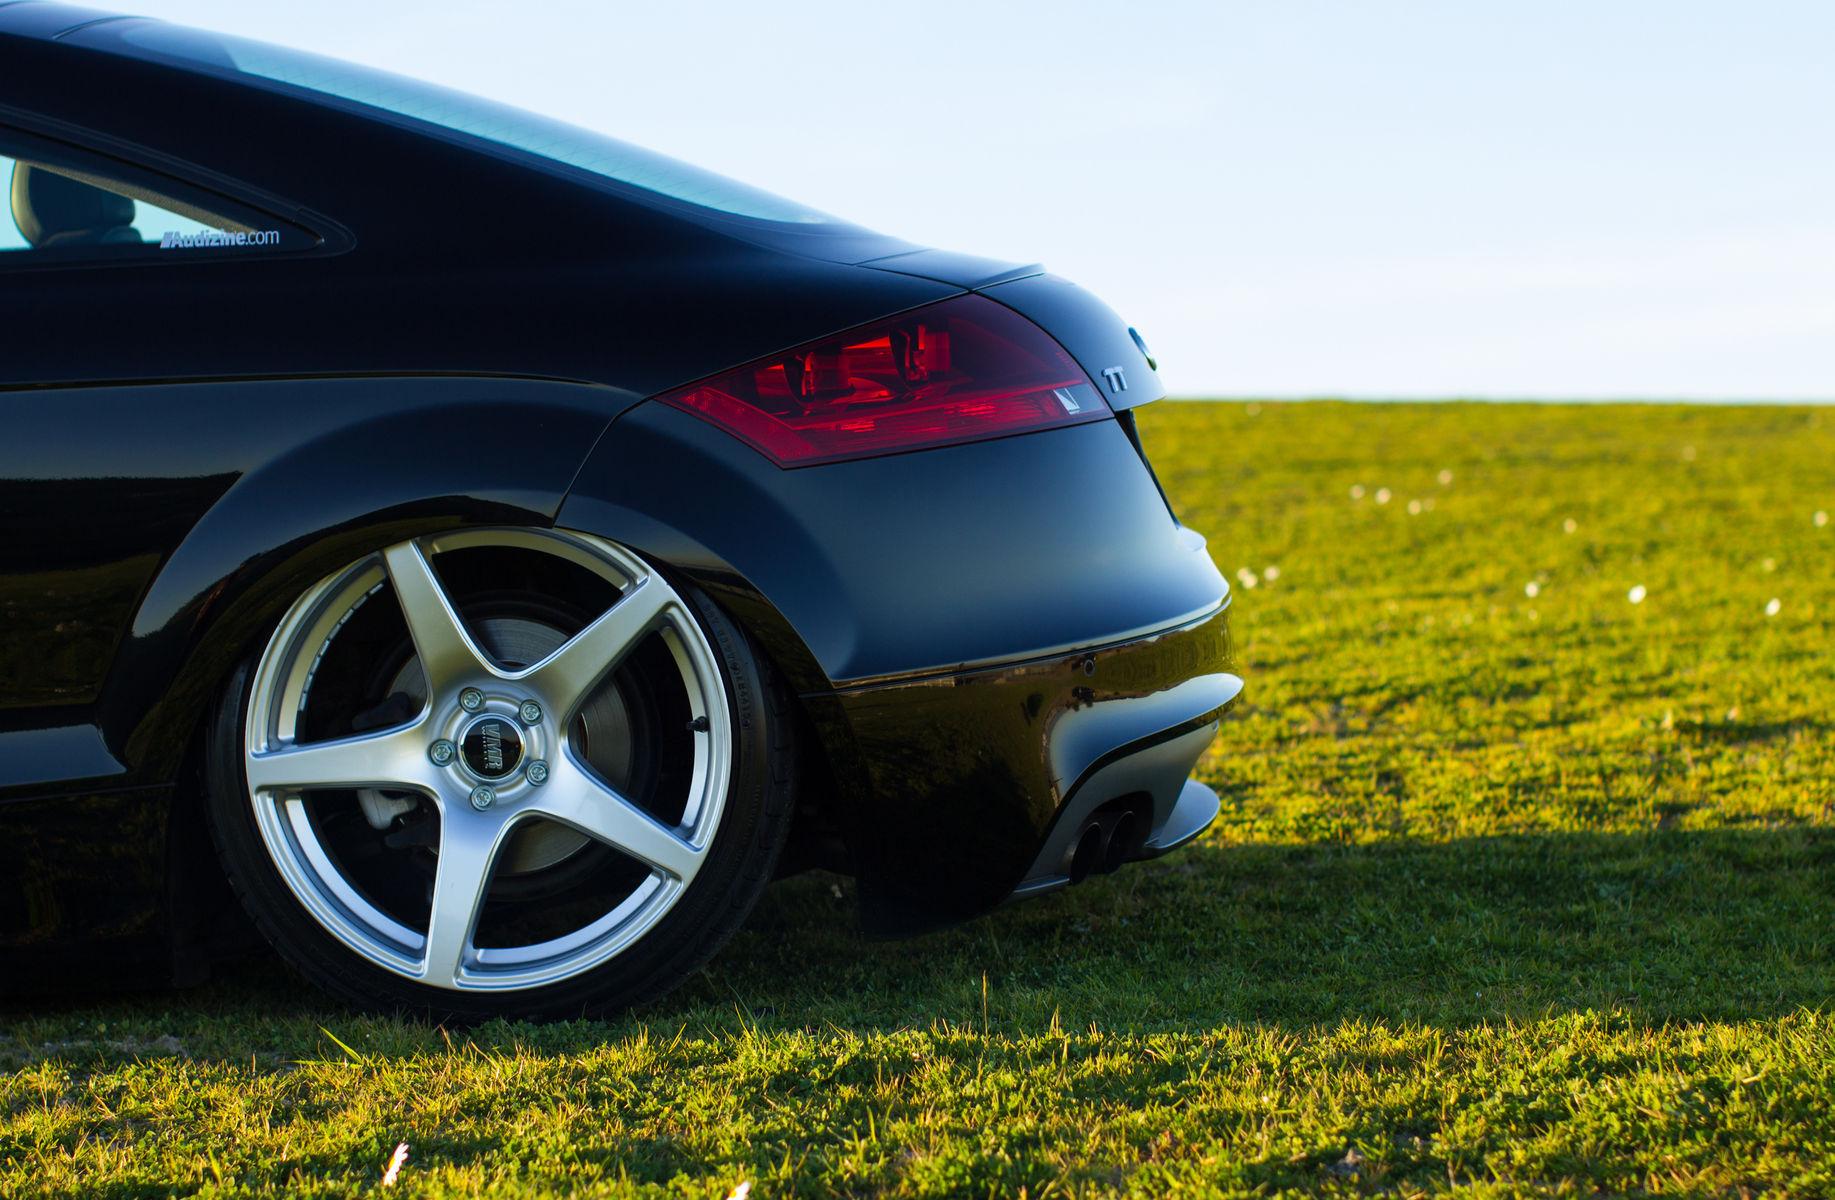 2009 Audi TT   Audizine Audi TT